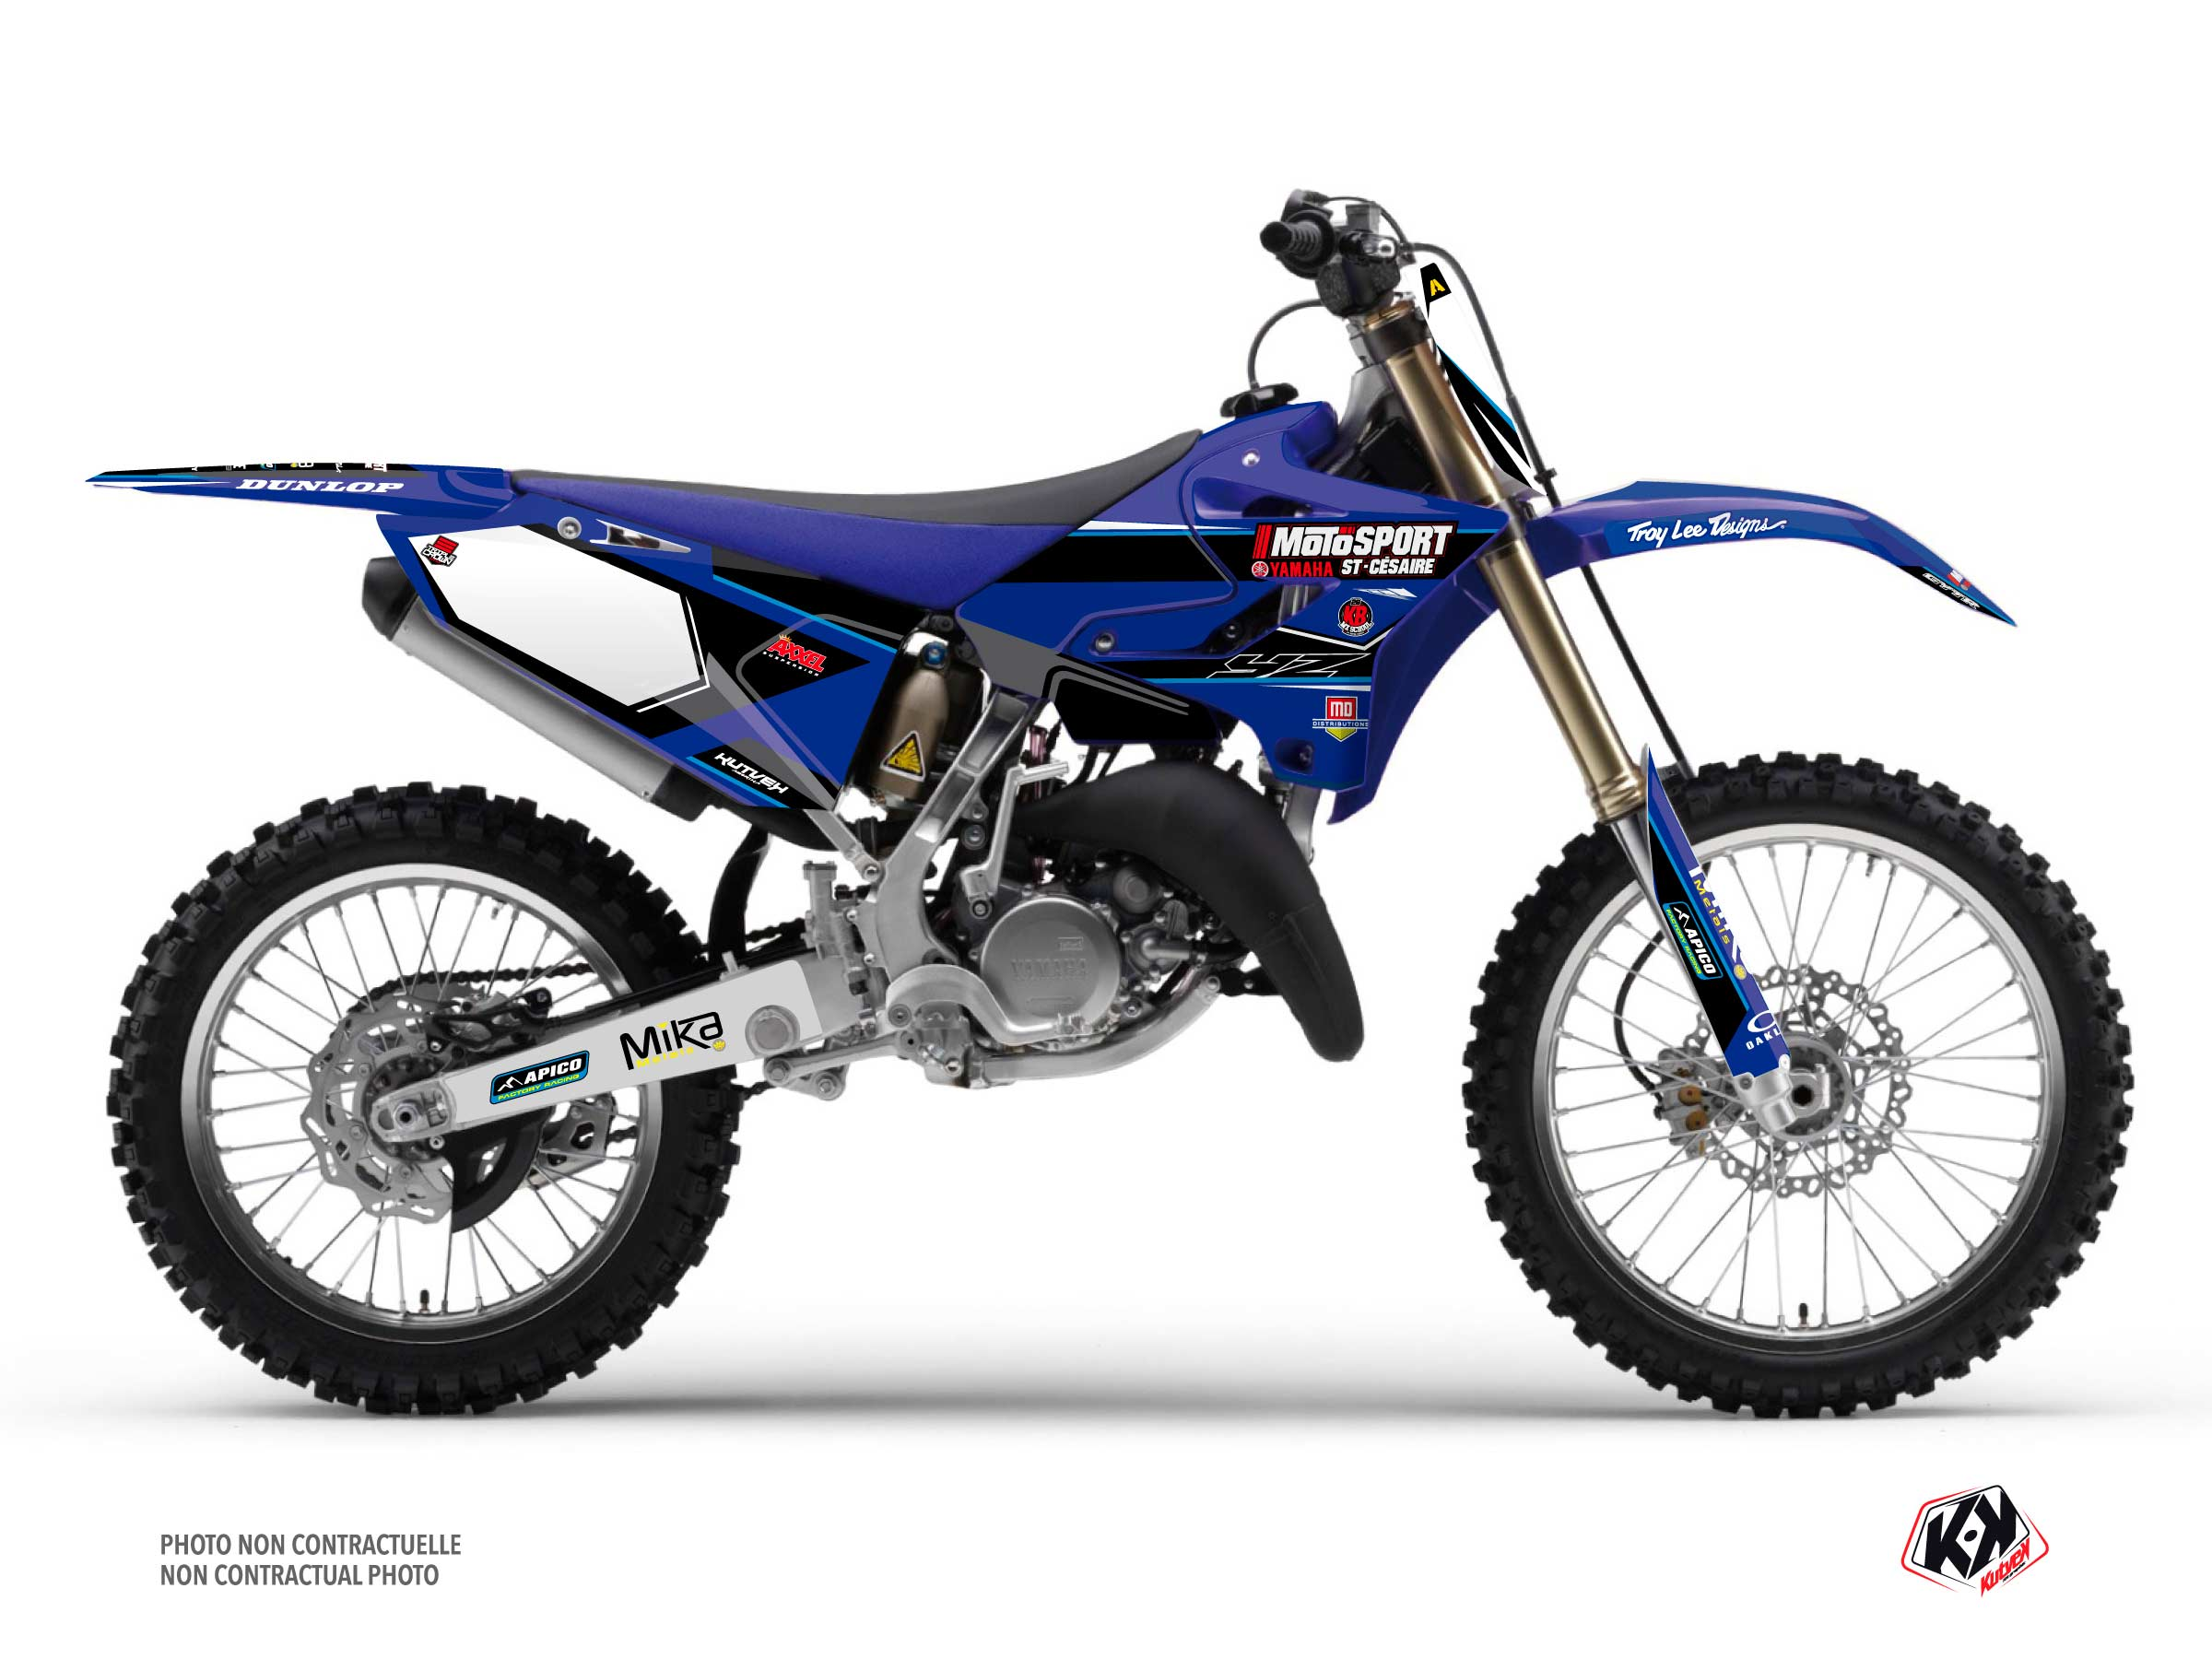 Yamaha 250 YZ Dirt Bike Replica Kaven Benoit K21 Graphic Kit